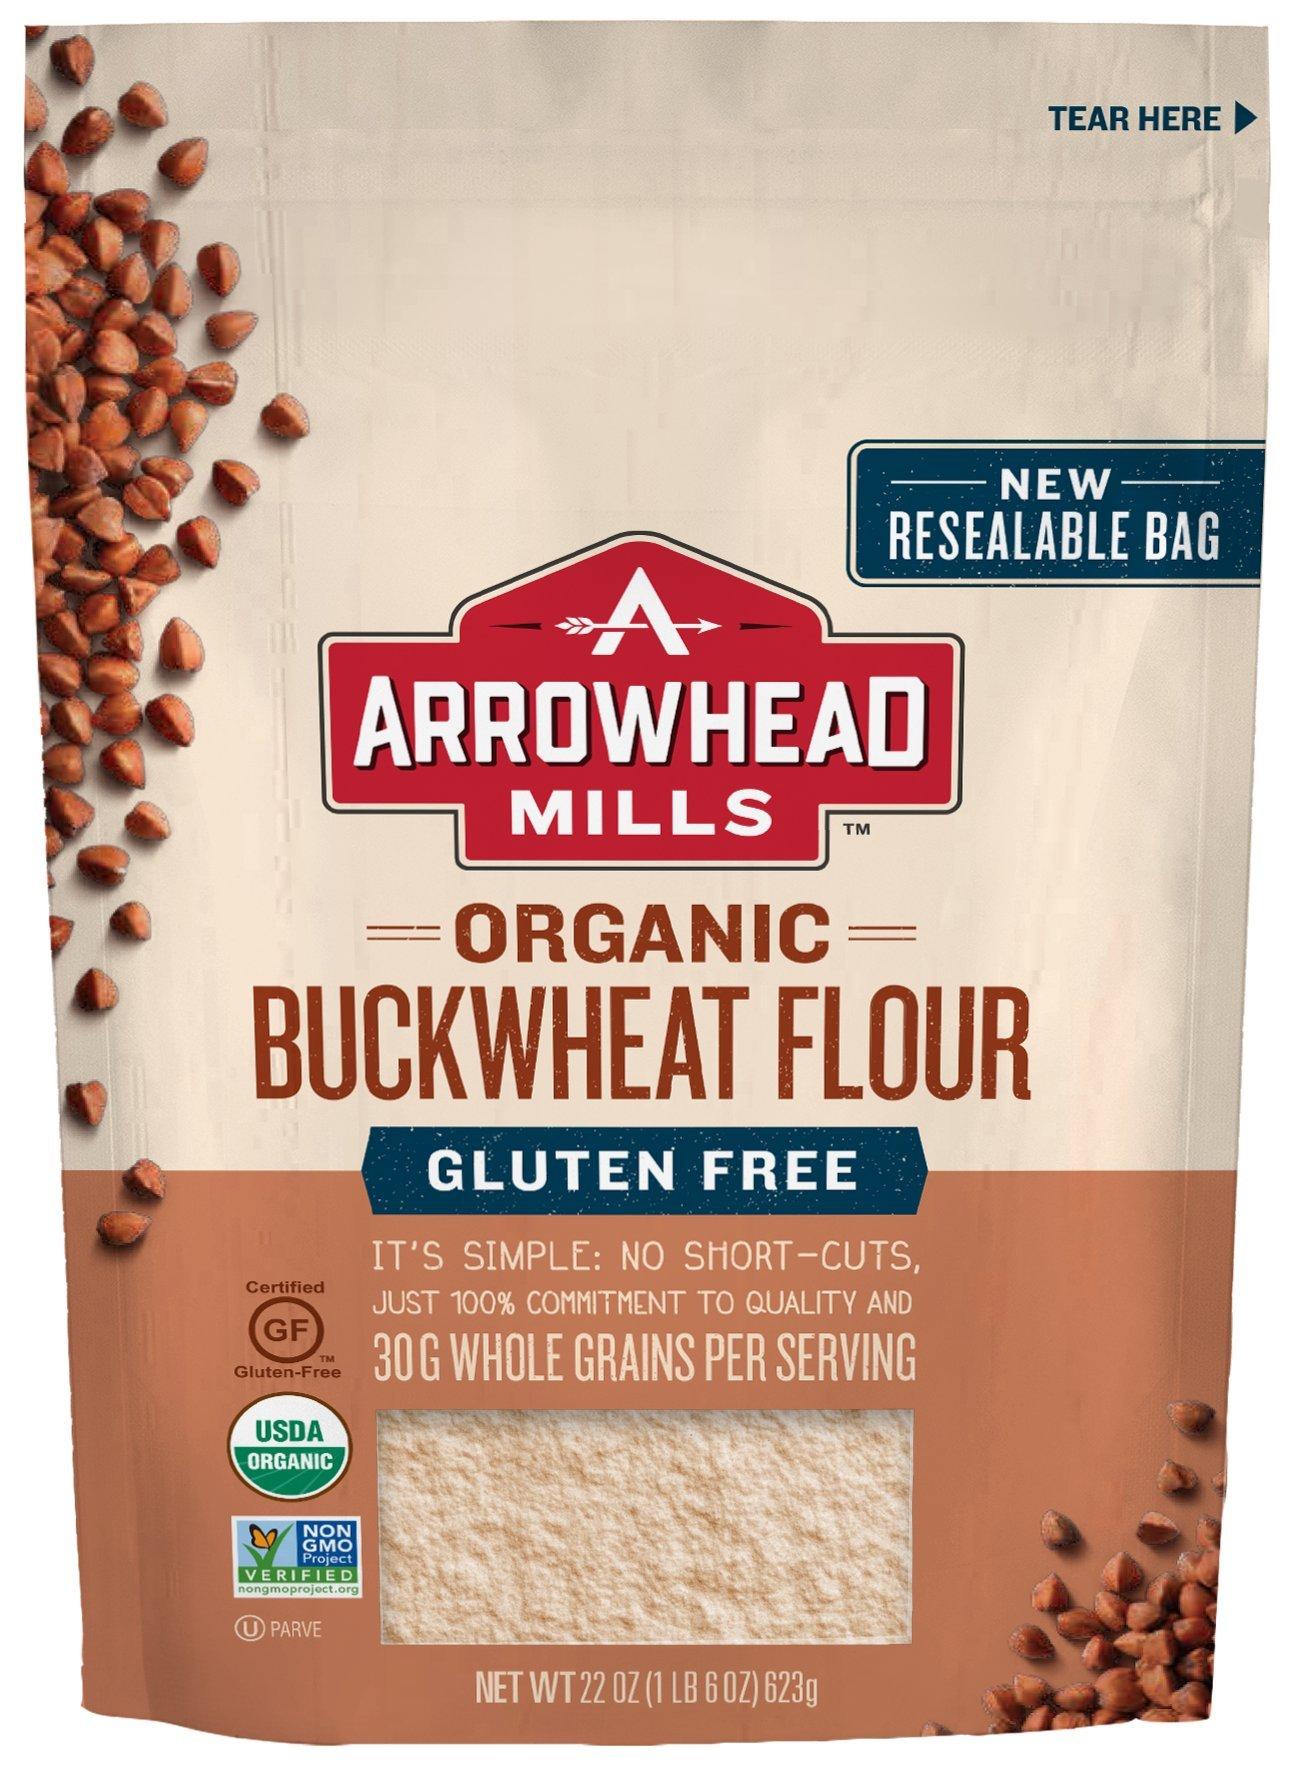 Arrowhead Mills Organic Gluten Free Buckwheat Flour, 22 oz. Bag (Pack of 6) by Arrowhead Mills